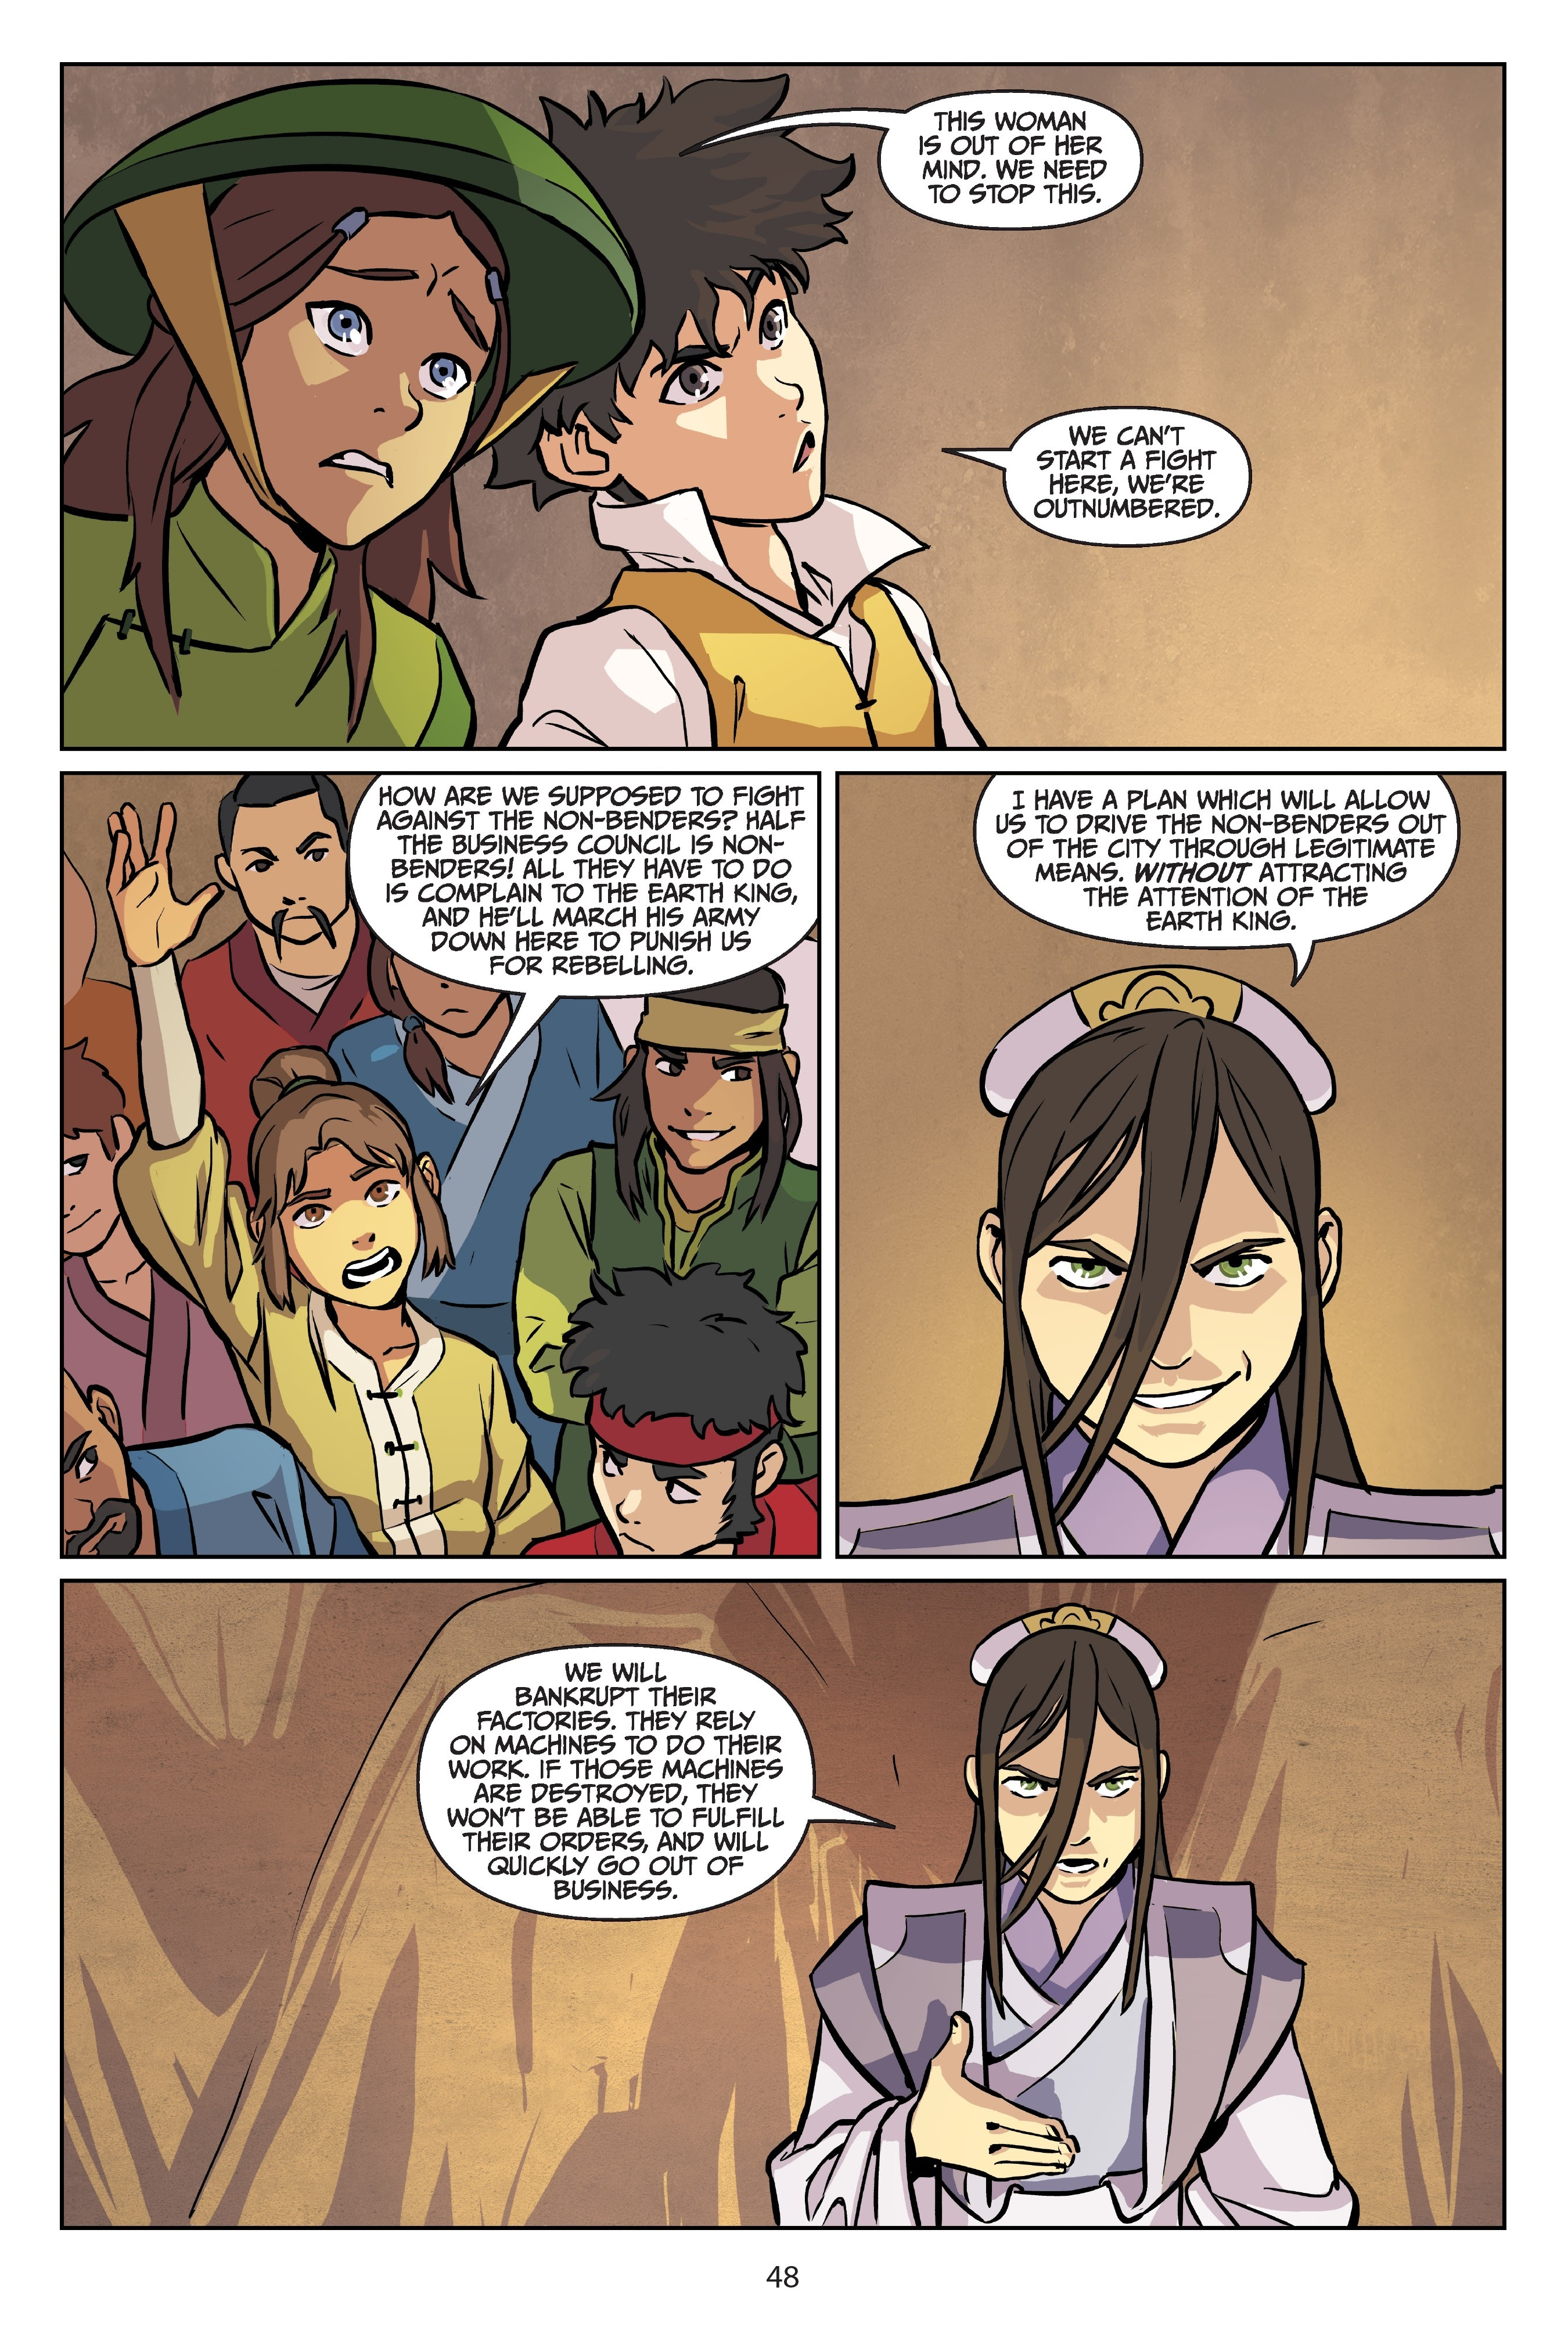 Nickelodeon Avatar: The Last Airbender - Imbalance TPB_2 Page 48